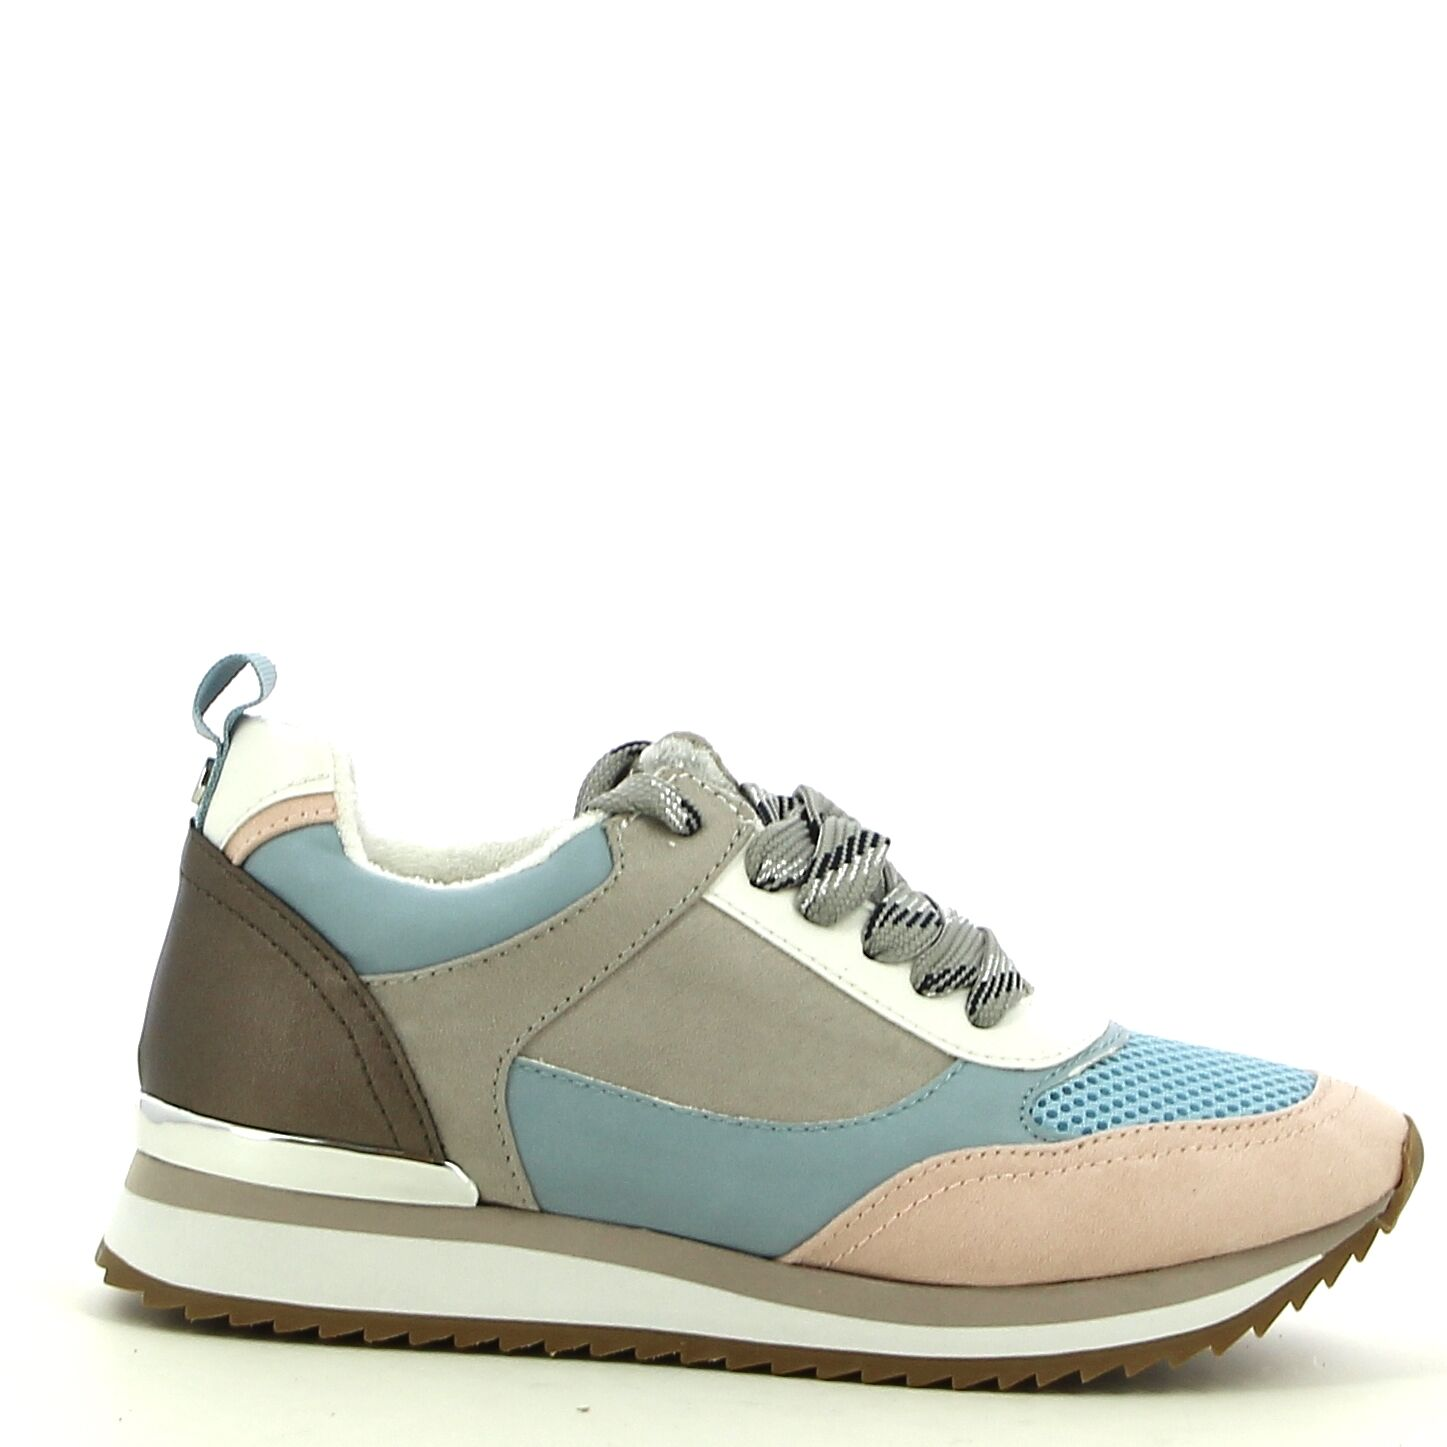 Ken Shoe Fashion - Roze/Blauw - Sneakers